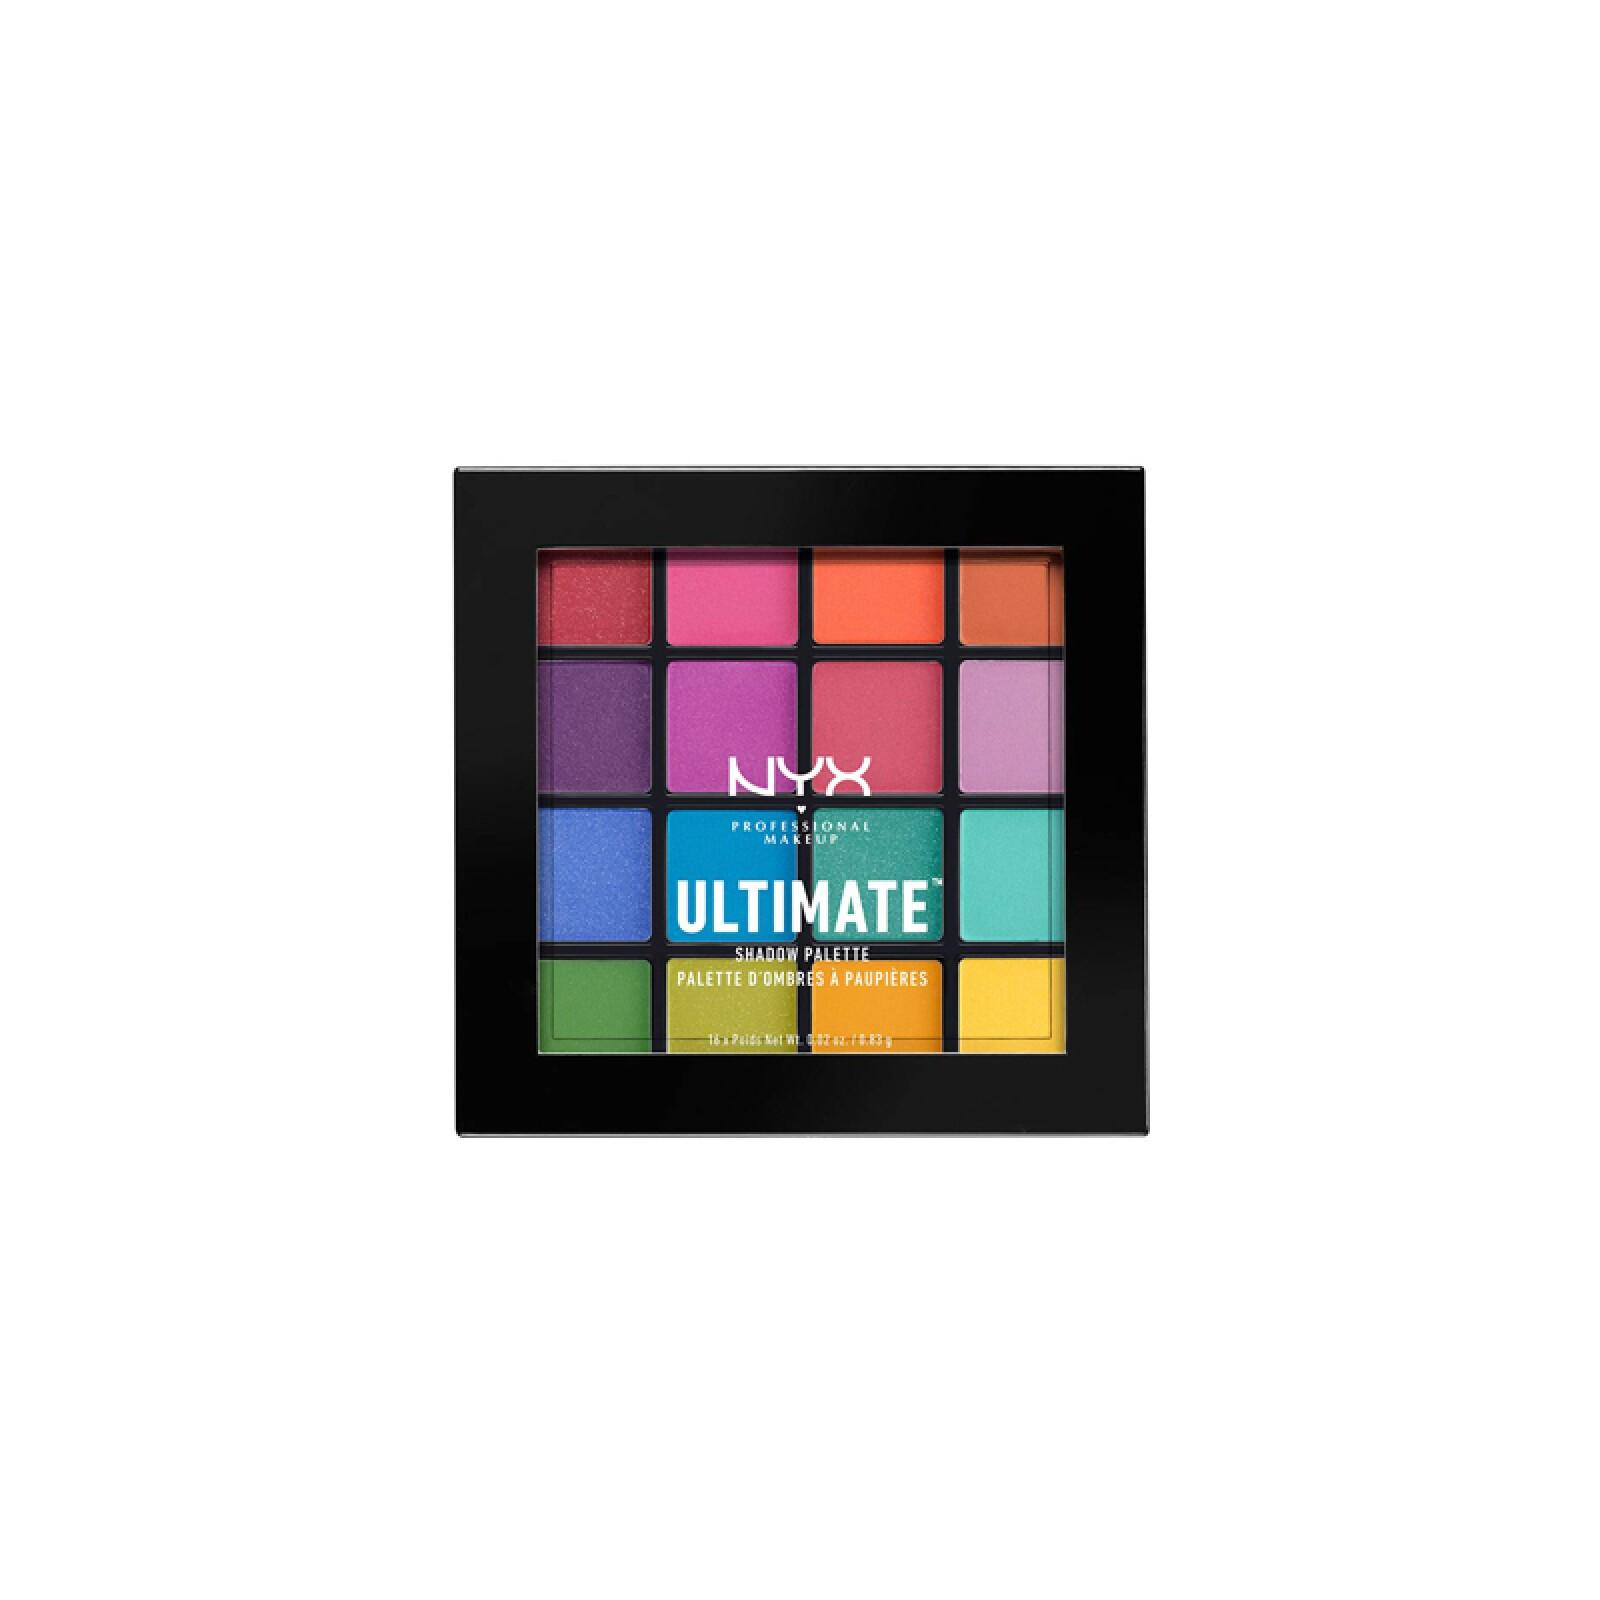 pride-makeup-maquillaje-glitter-color-rainbow-nyx